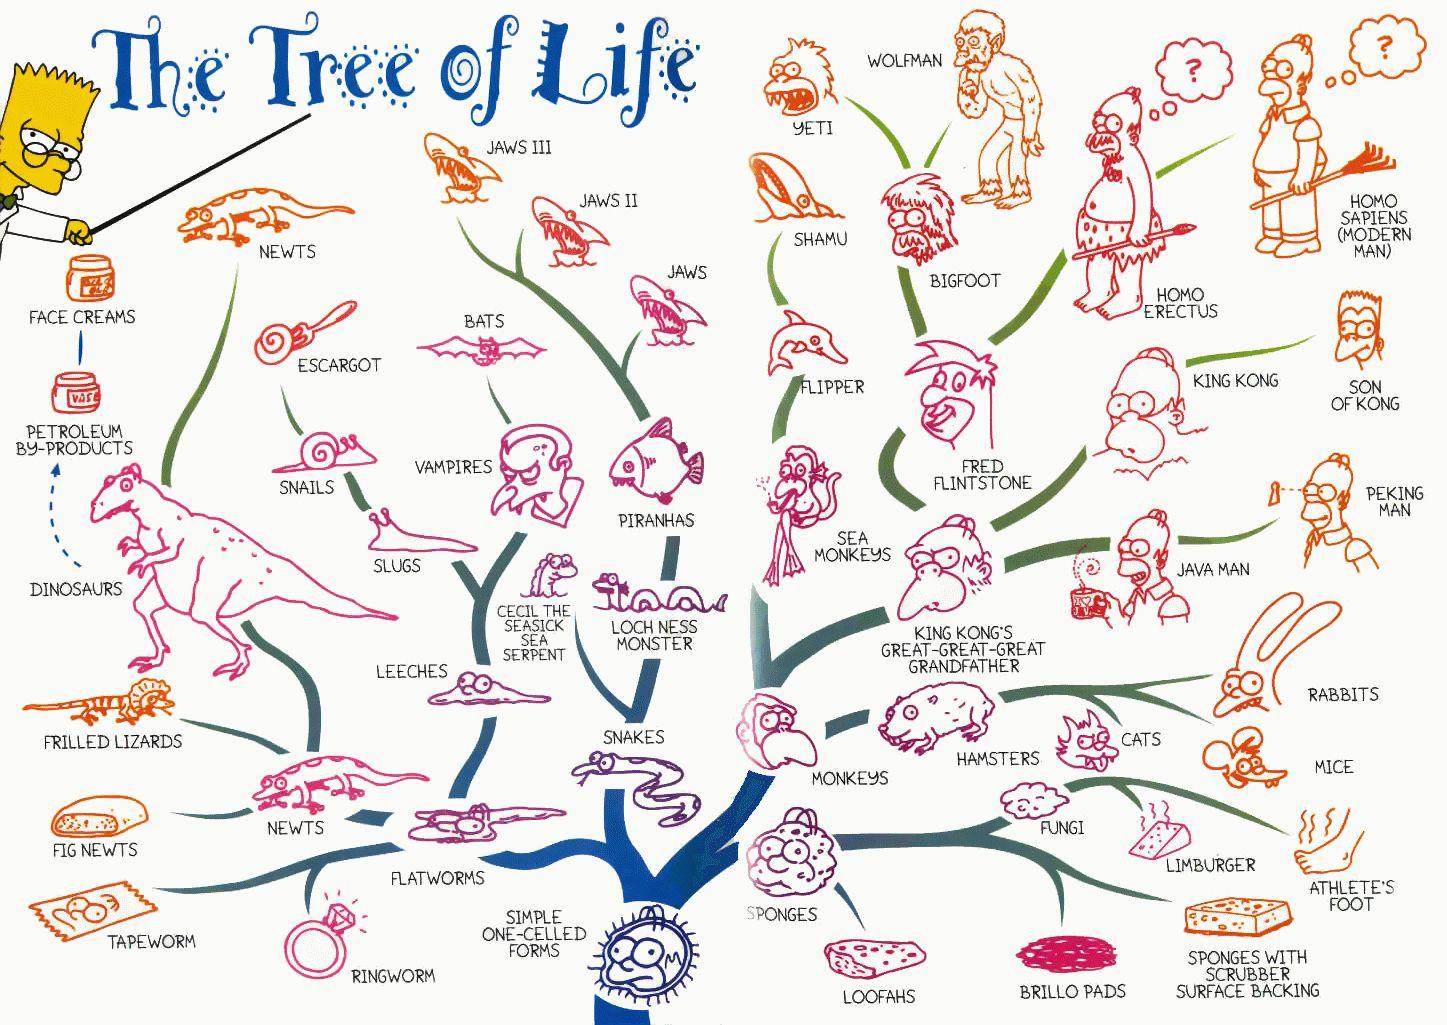 Tree Of Life Evolution Of Life According To Bart Simpson Lol